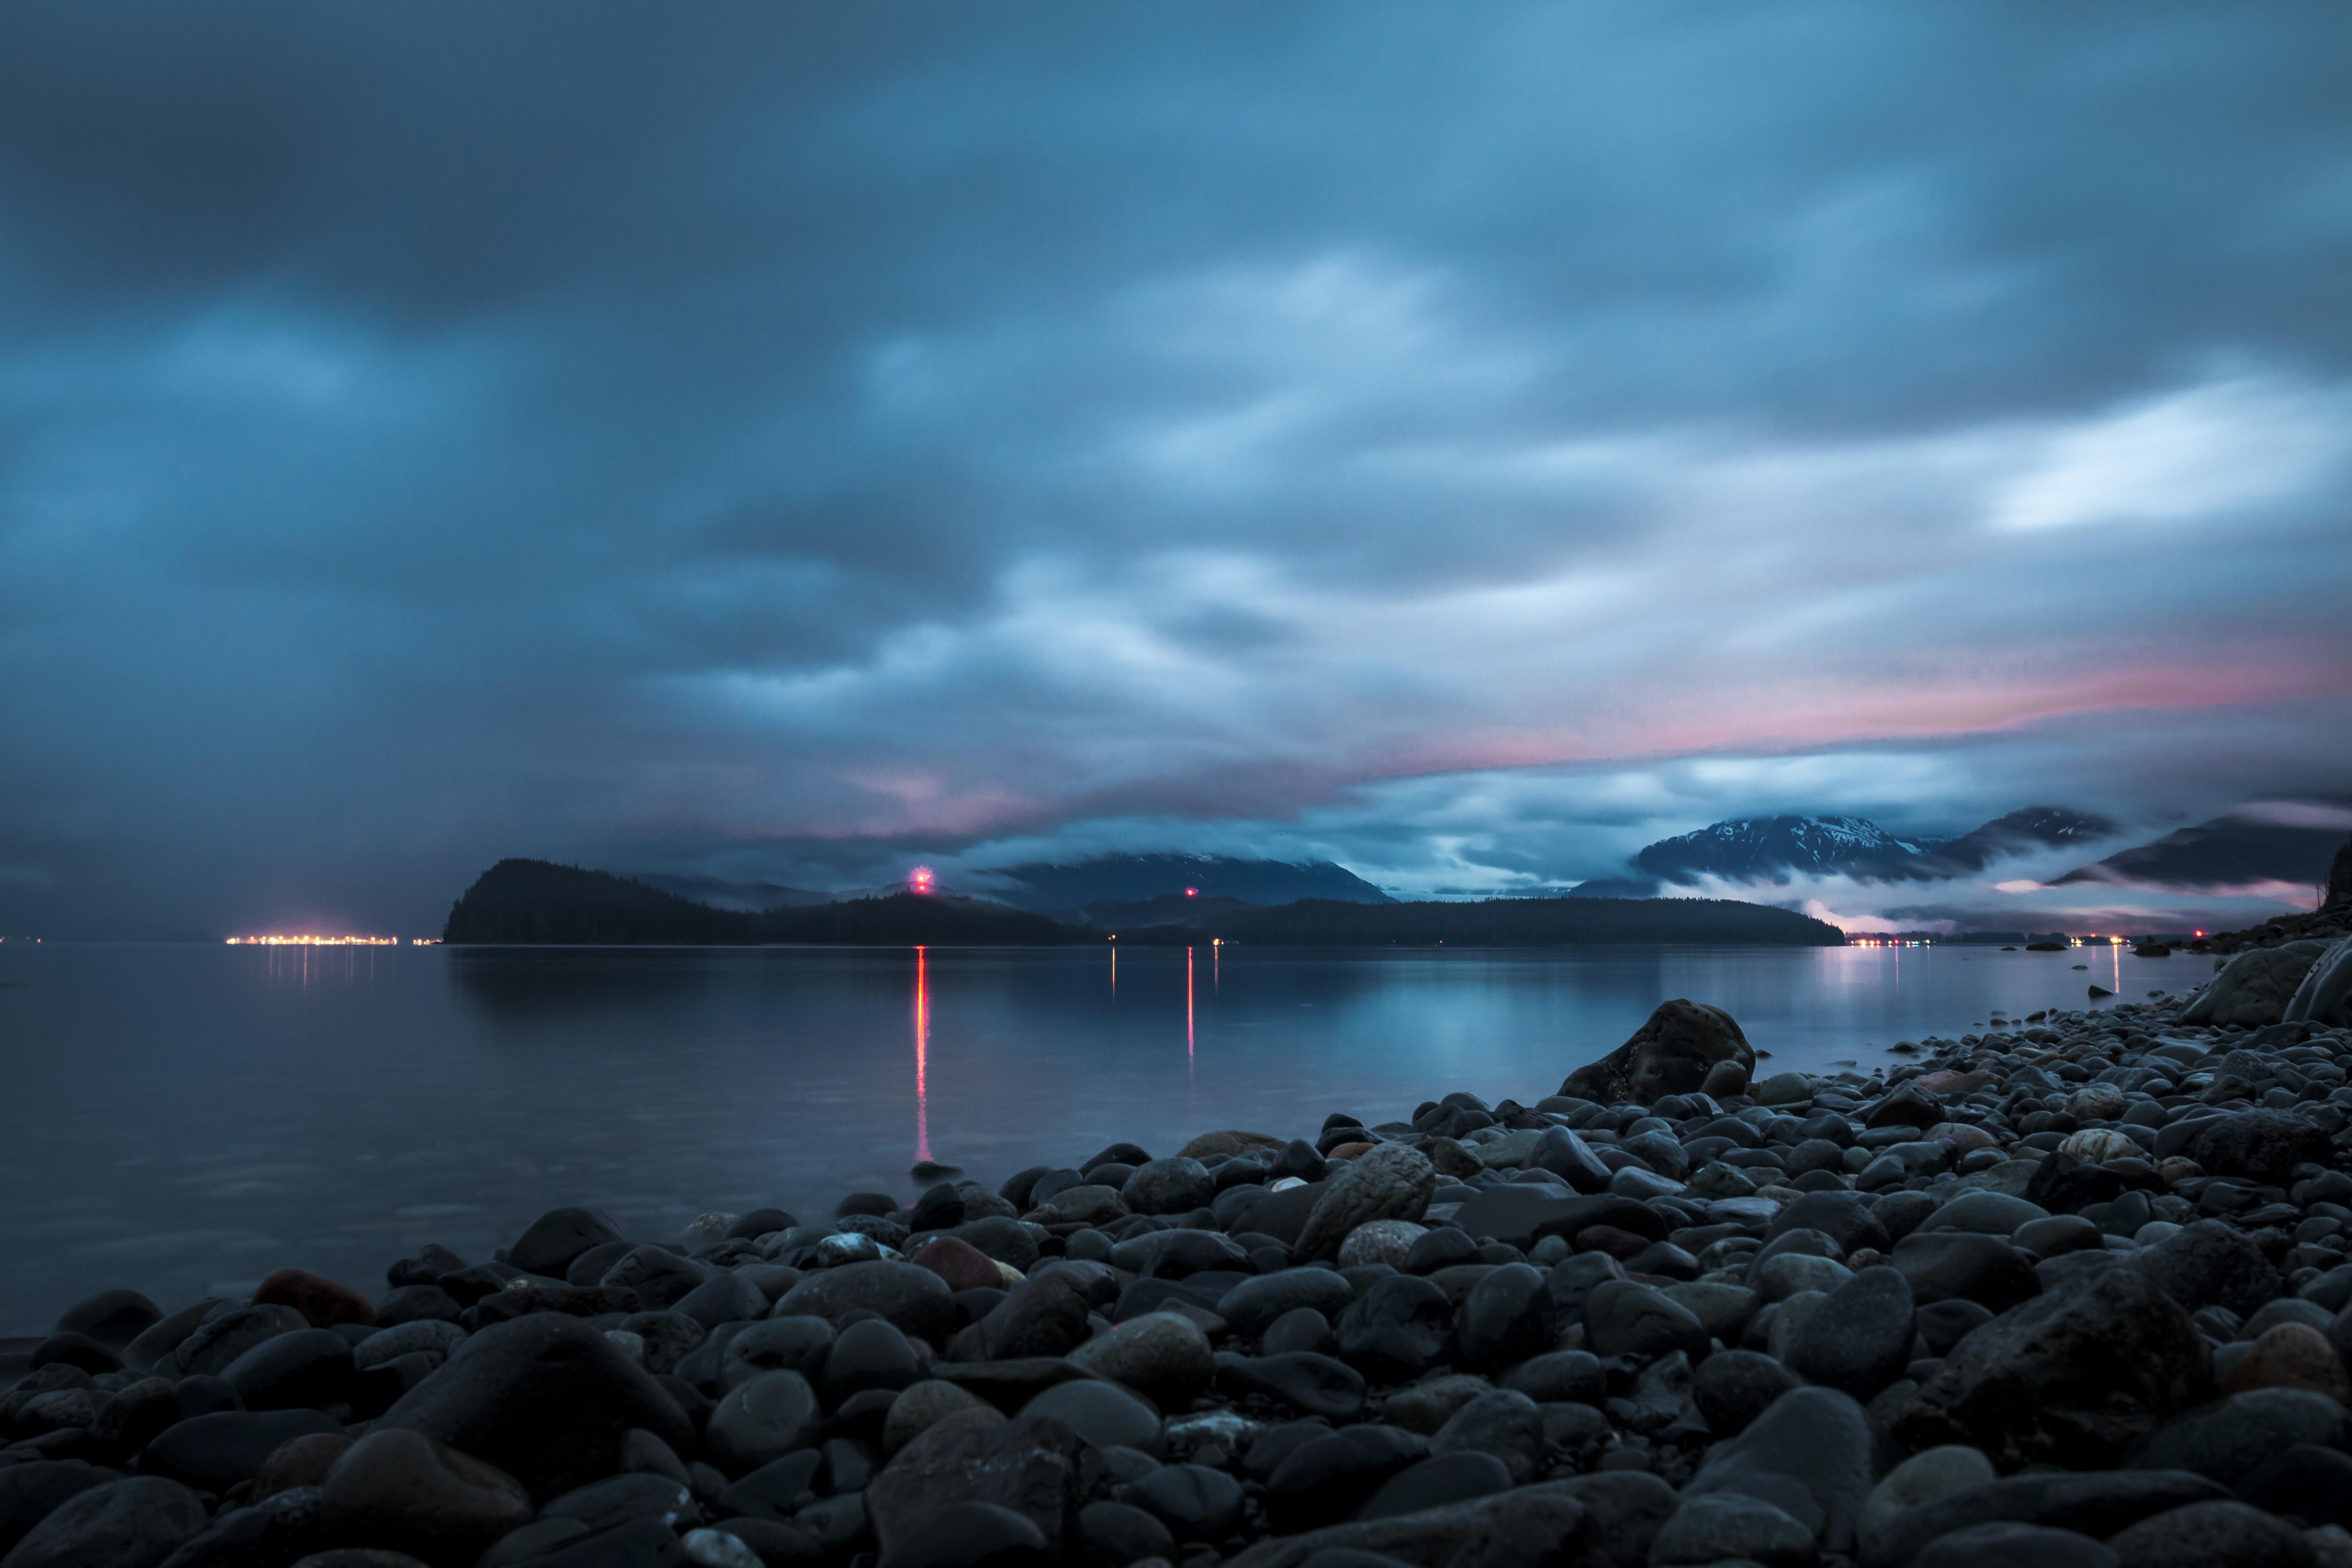 landscape photo of rocks near the body of water